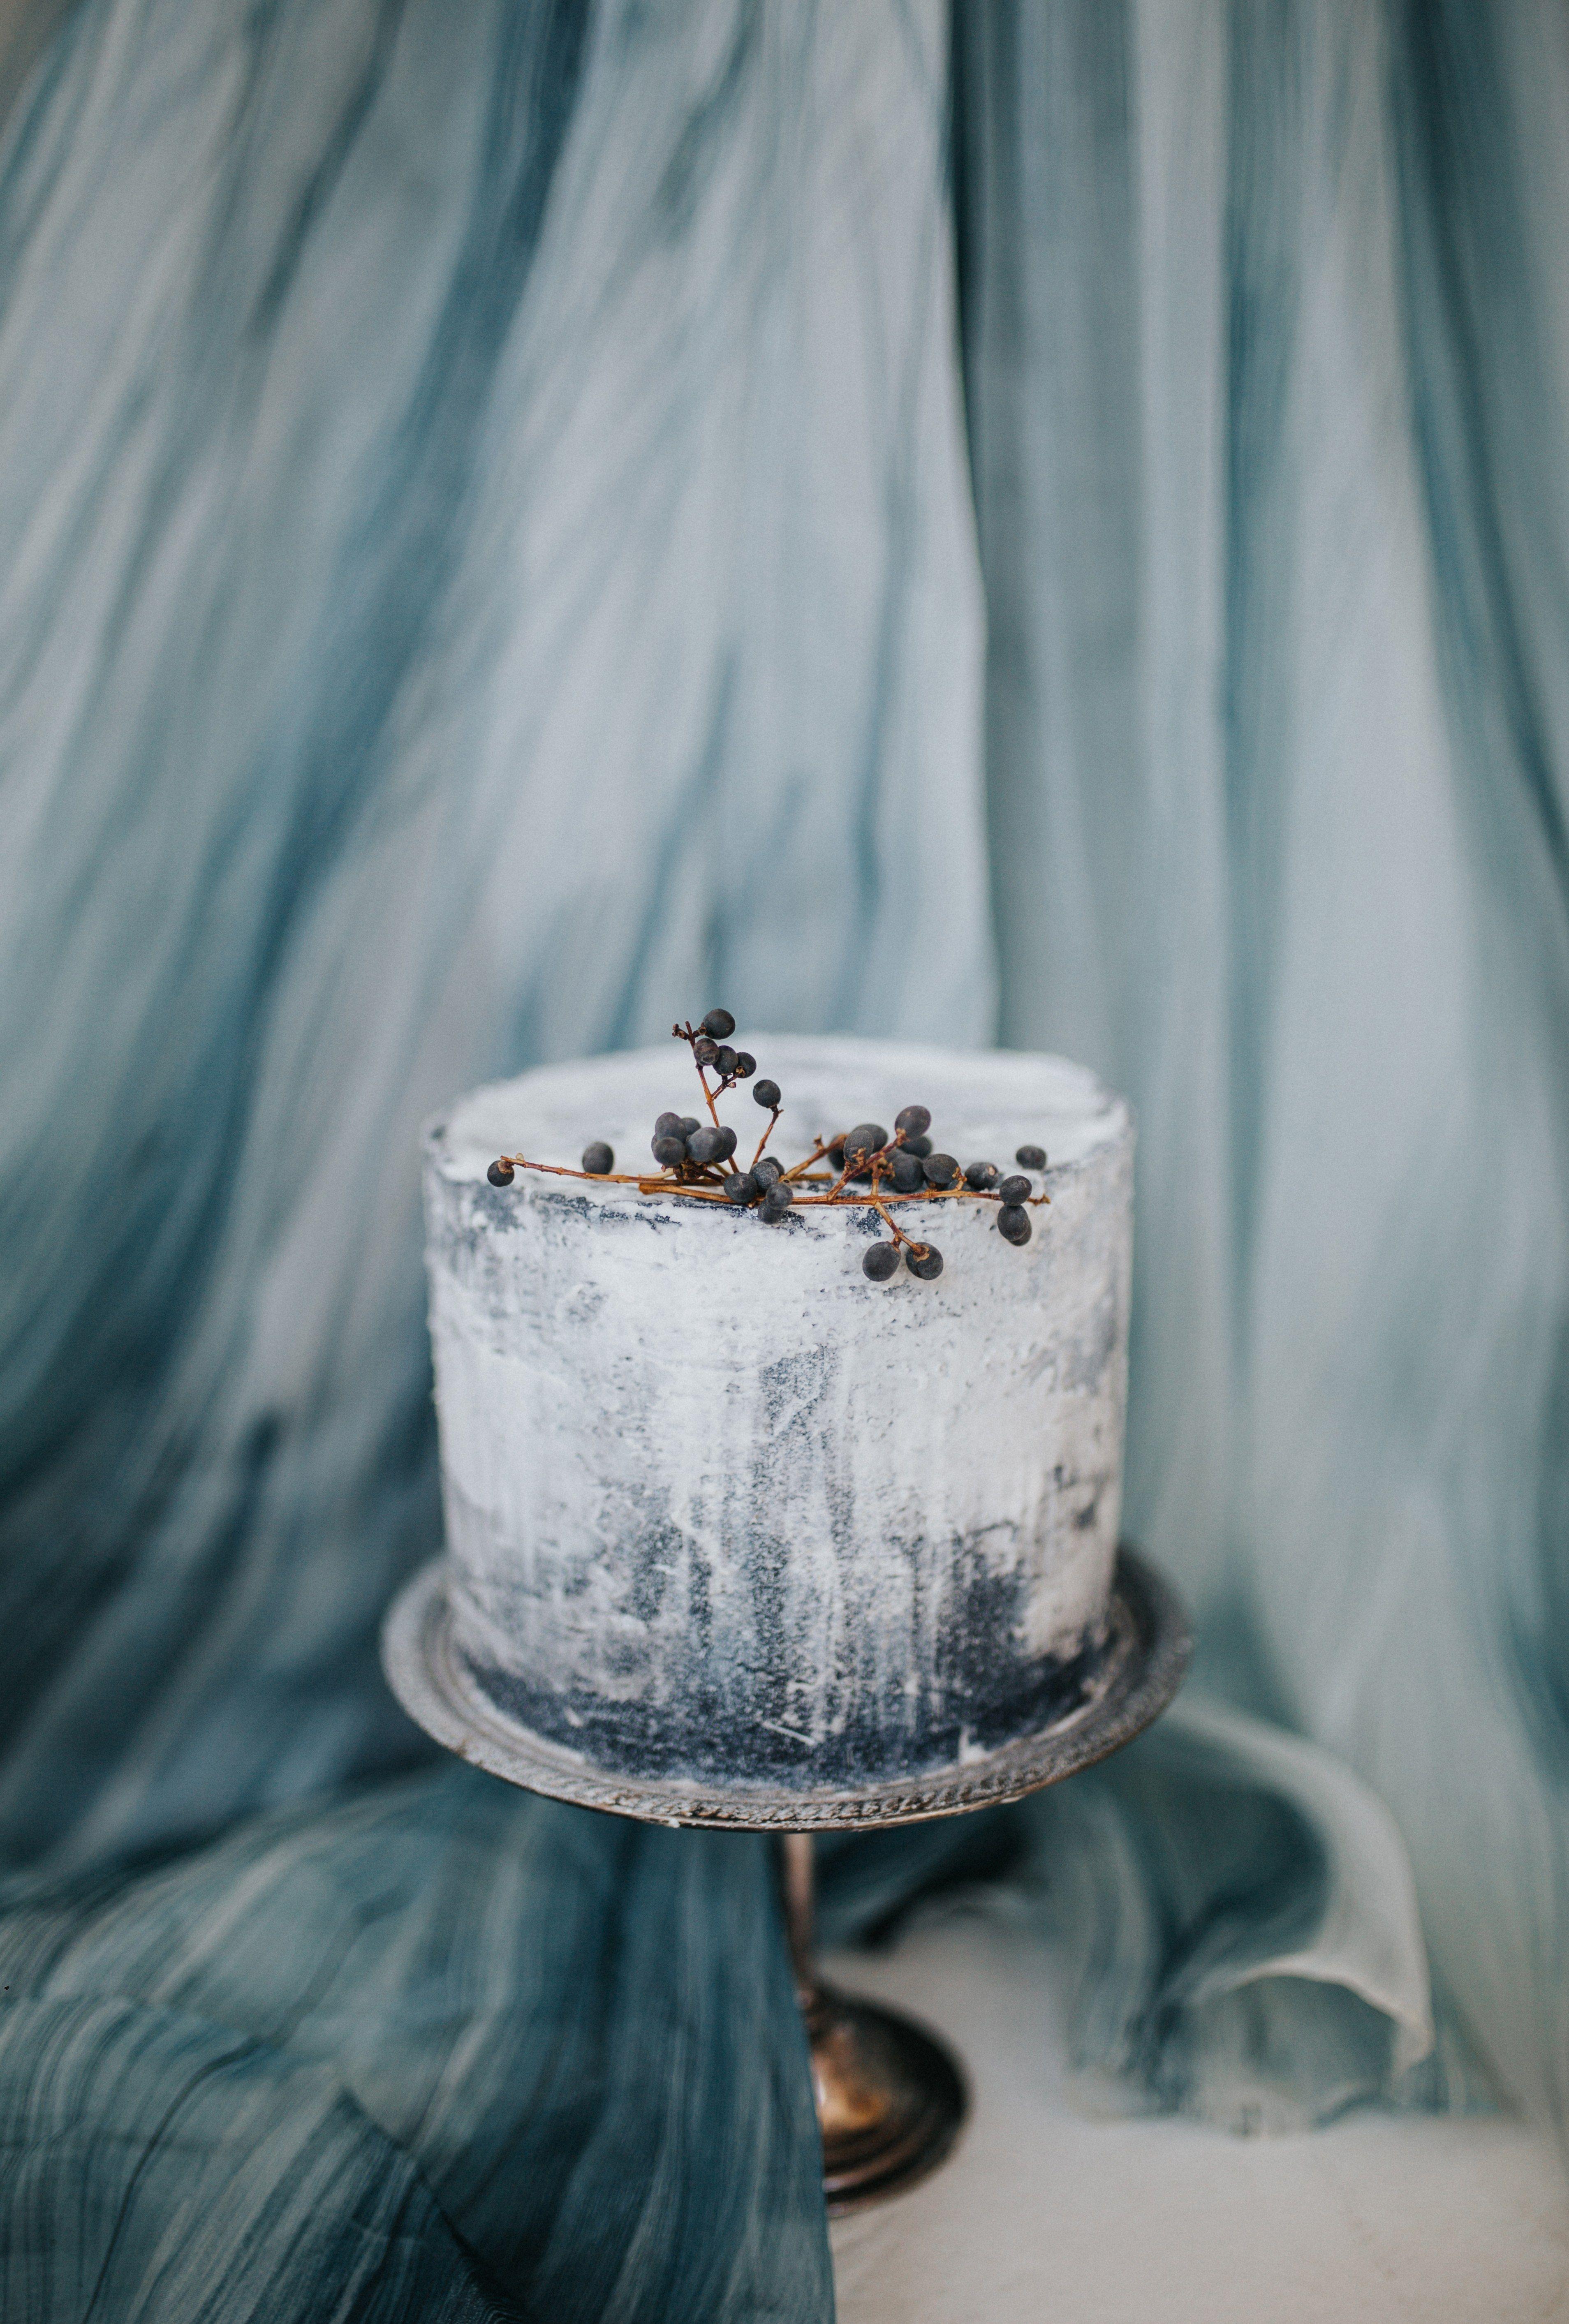 A work of art ivy u stone cake design weddingcake